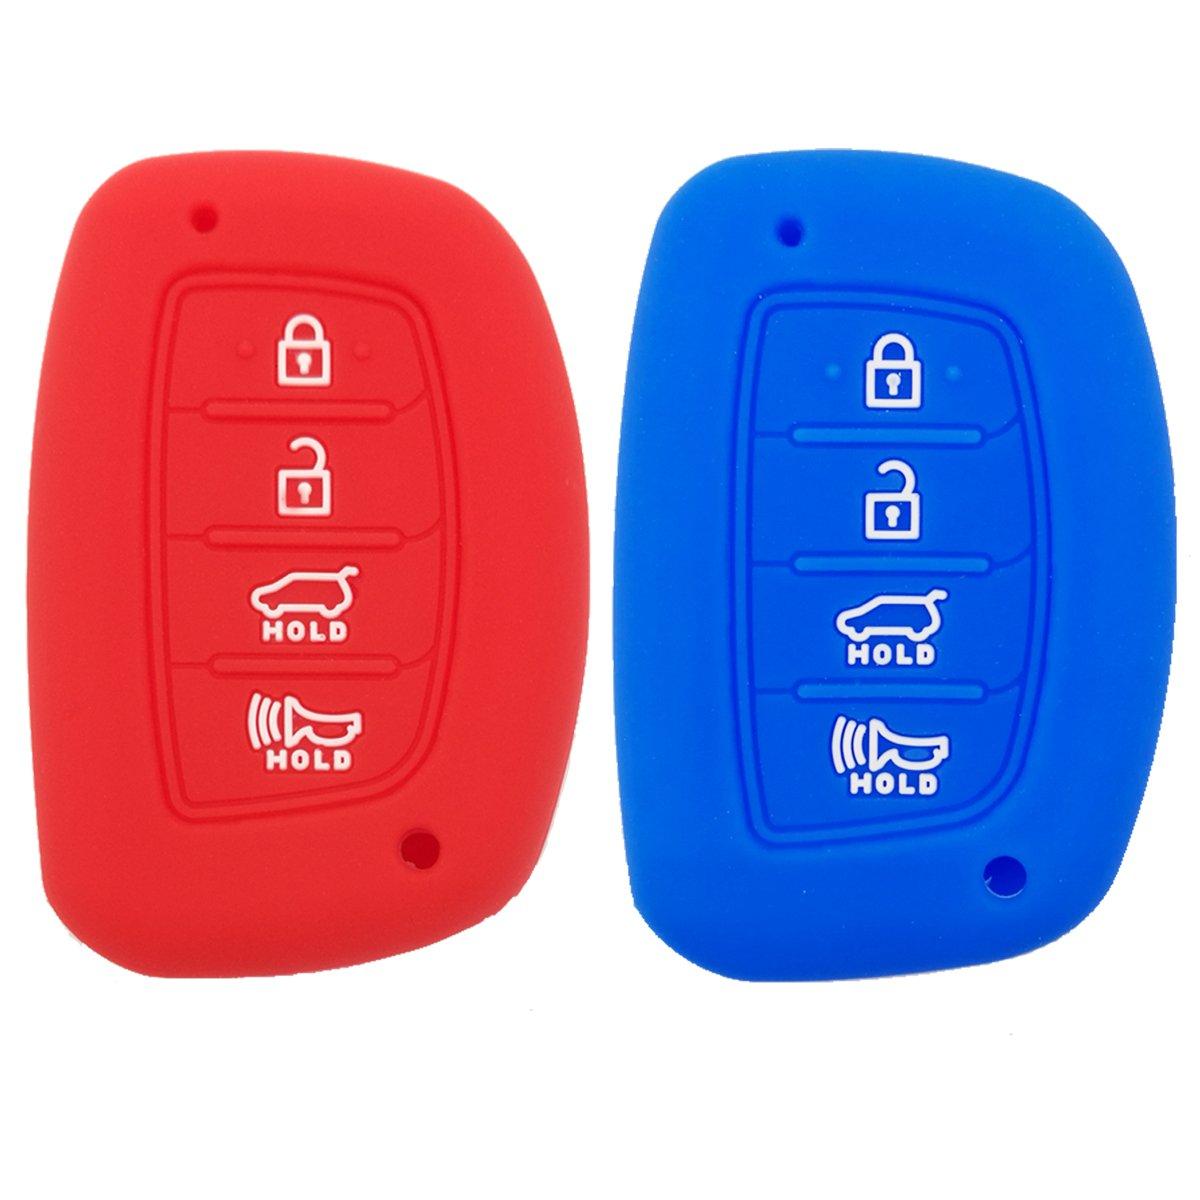 Coolbestda 2Pcs Rubber Smart Key Fob Cover Case Remote Skin Keyless Jacket Protector for 2018 2017 2016 Hyundai Tucson Elantra Sonata 4Buttons (NOT FIT Flip/Pop Out/Folding key)